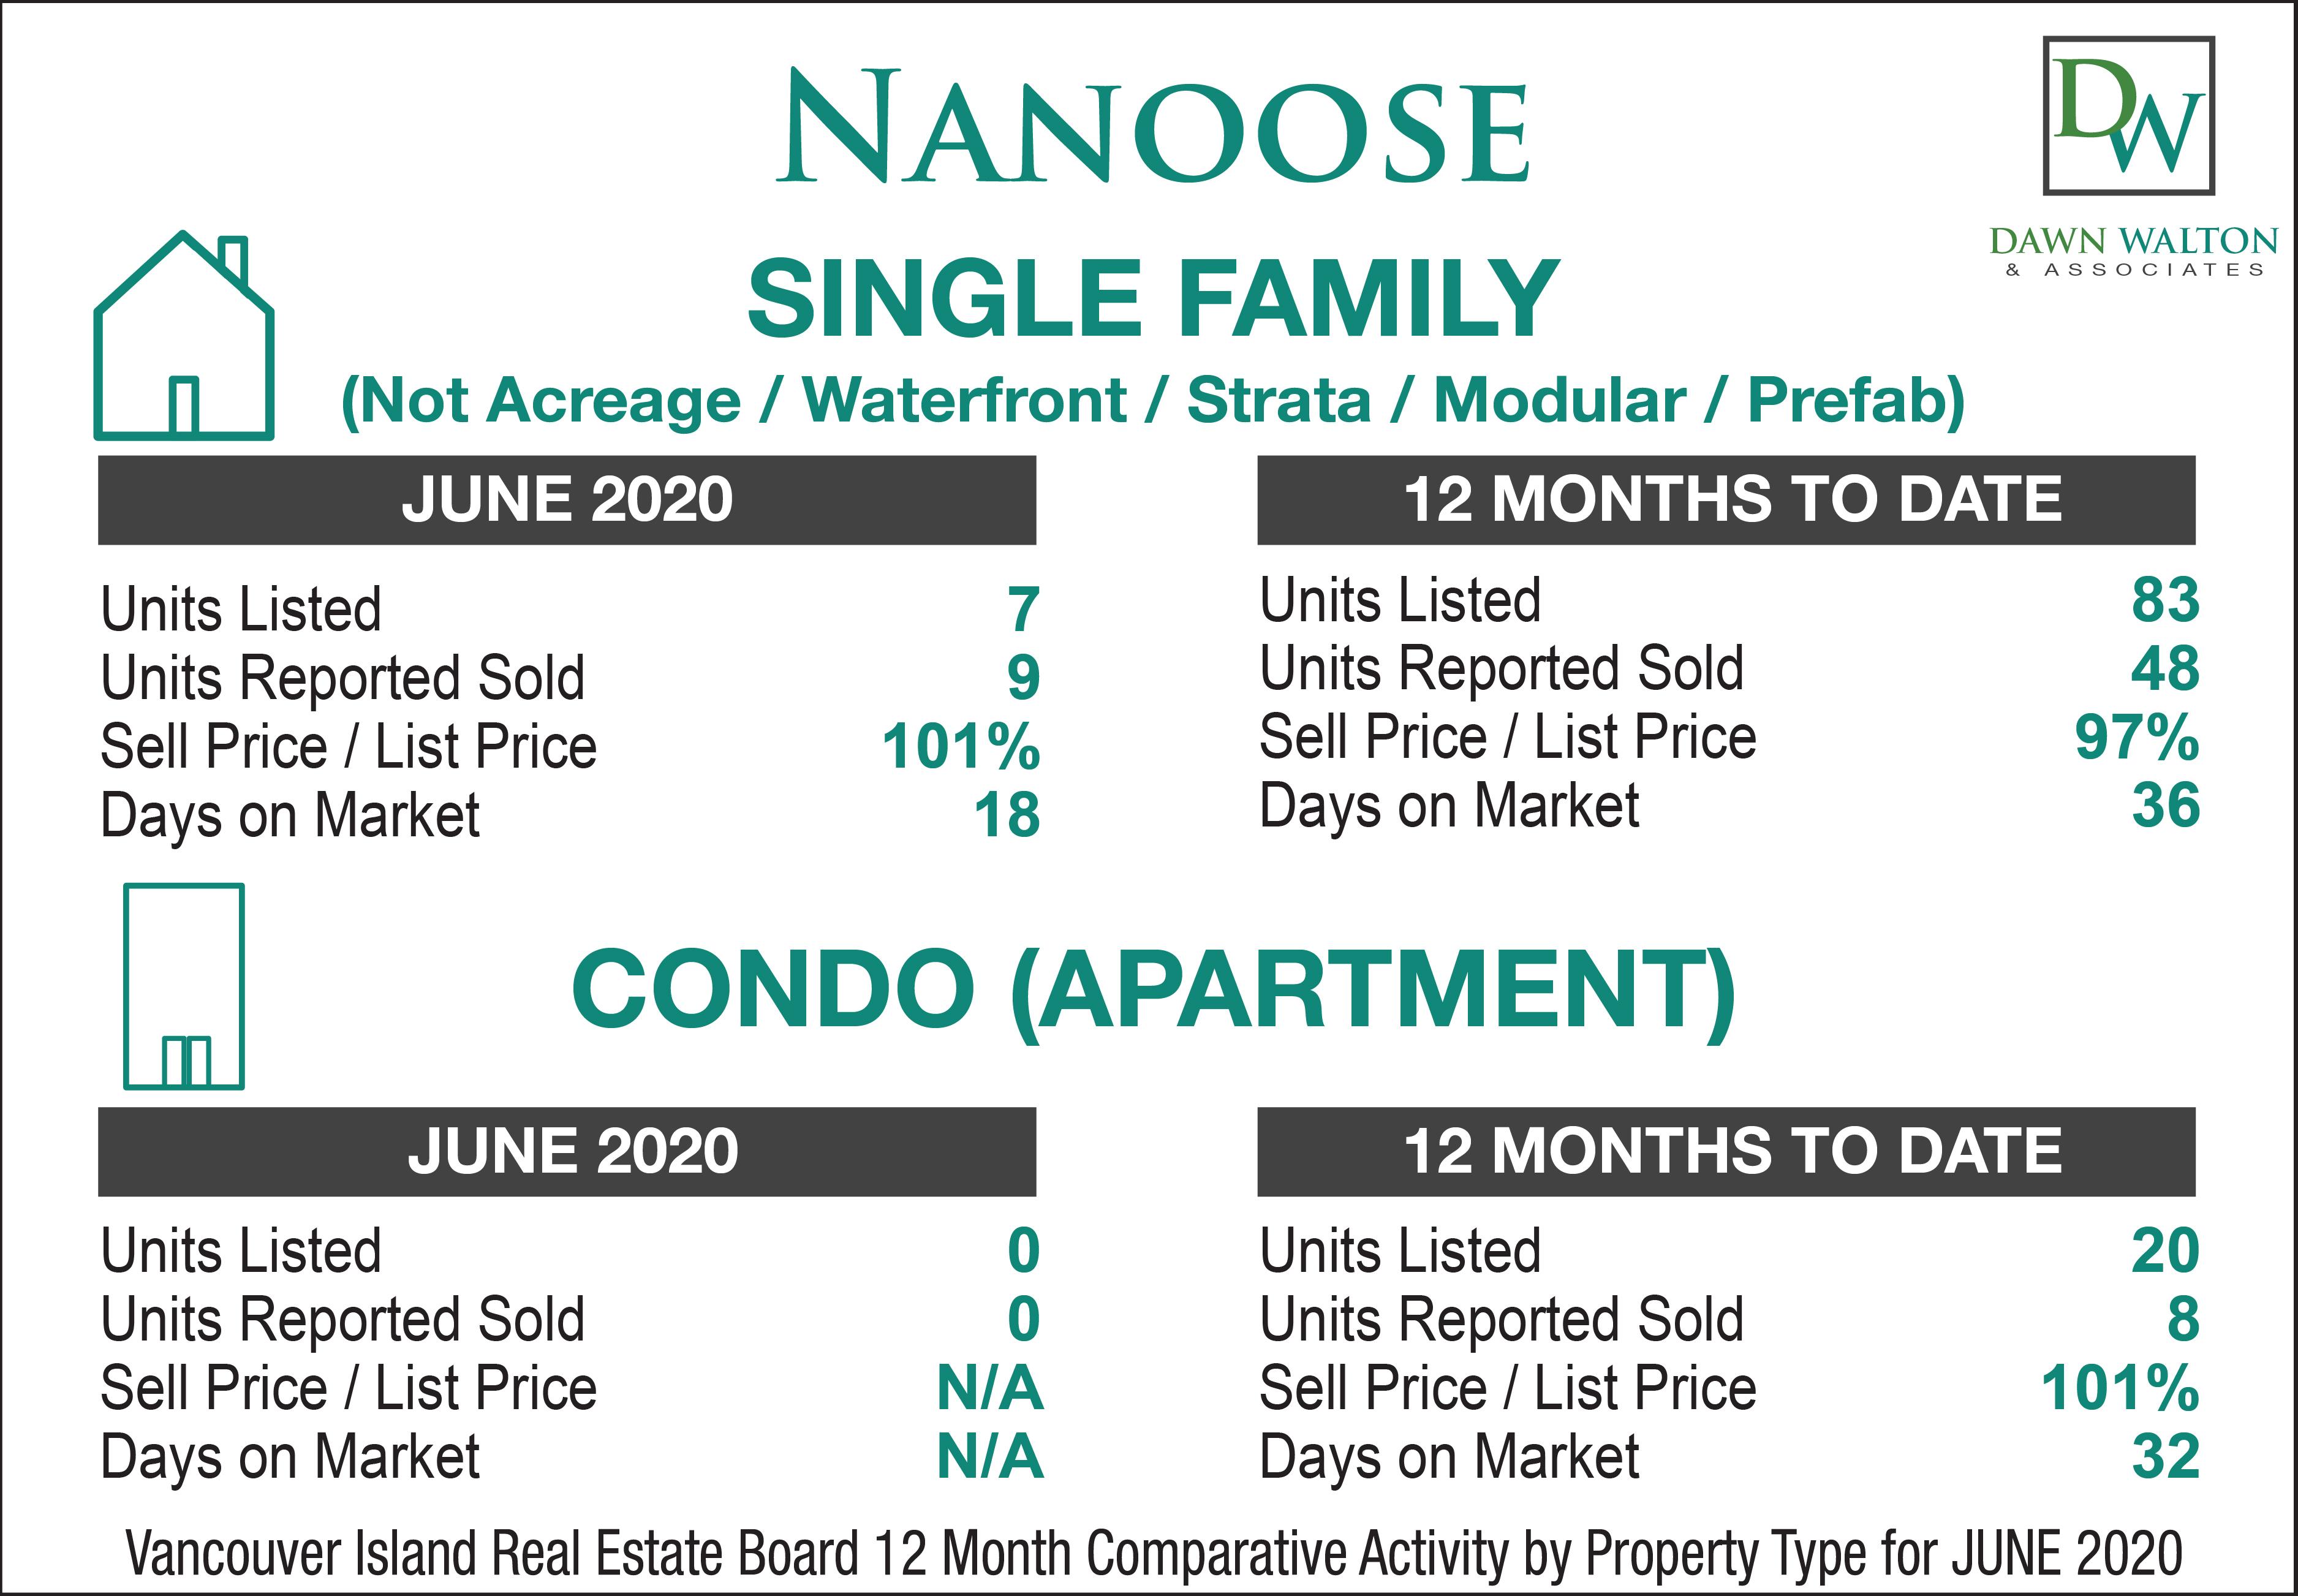 Nanoose Real Estate Market Stats June 2020 - Nanaimo Realtor Dawn Walton